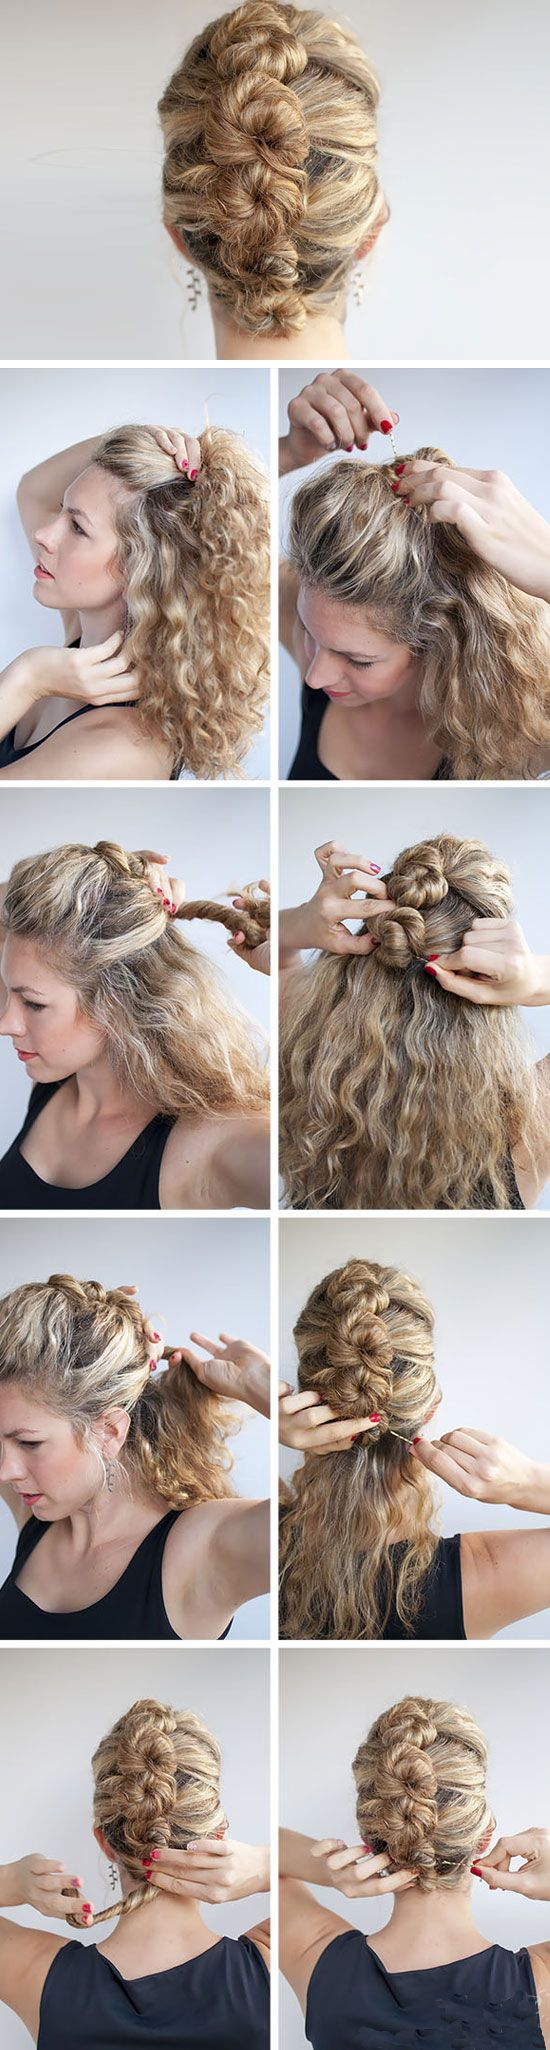 Easy diy wedding hairstyles for long hair medium hair diy wedding